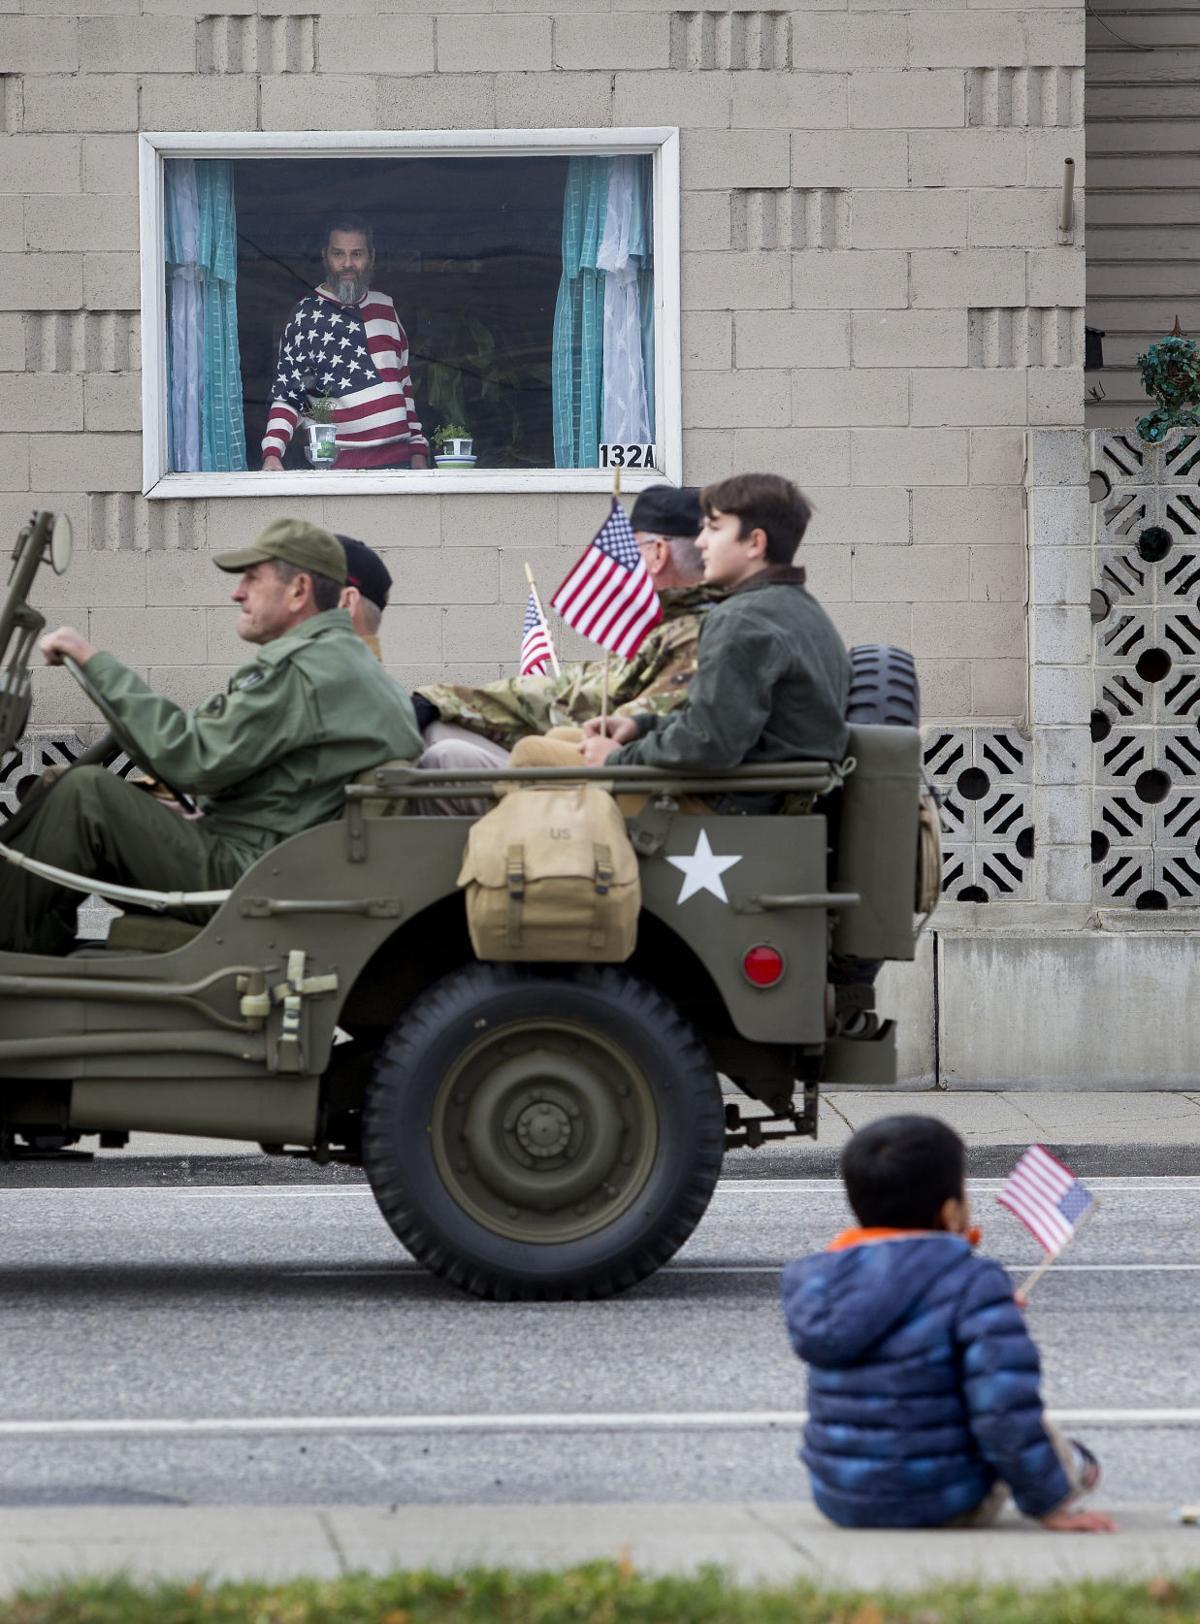 191112-newslocal-parade 01.jpg